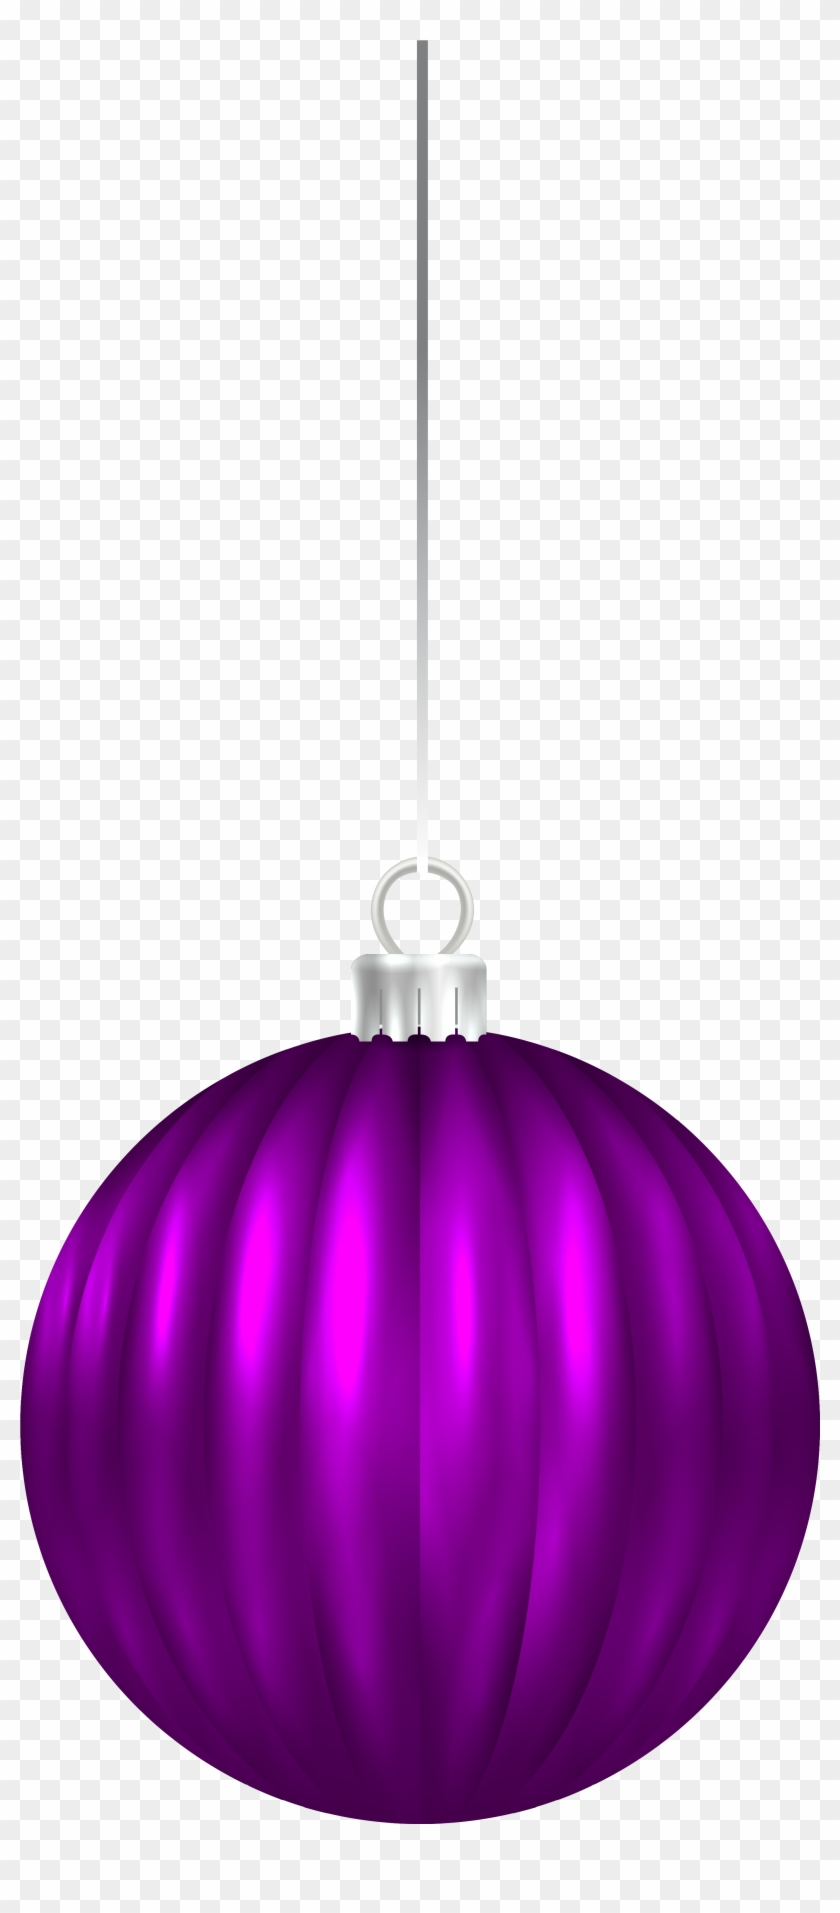 Purple Christmas Ball Ornament Png Clip Art Image - Purple Christmas Ornament Png #148975